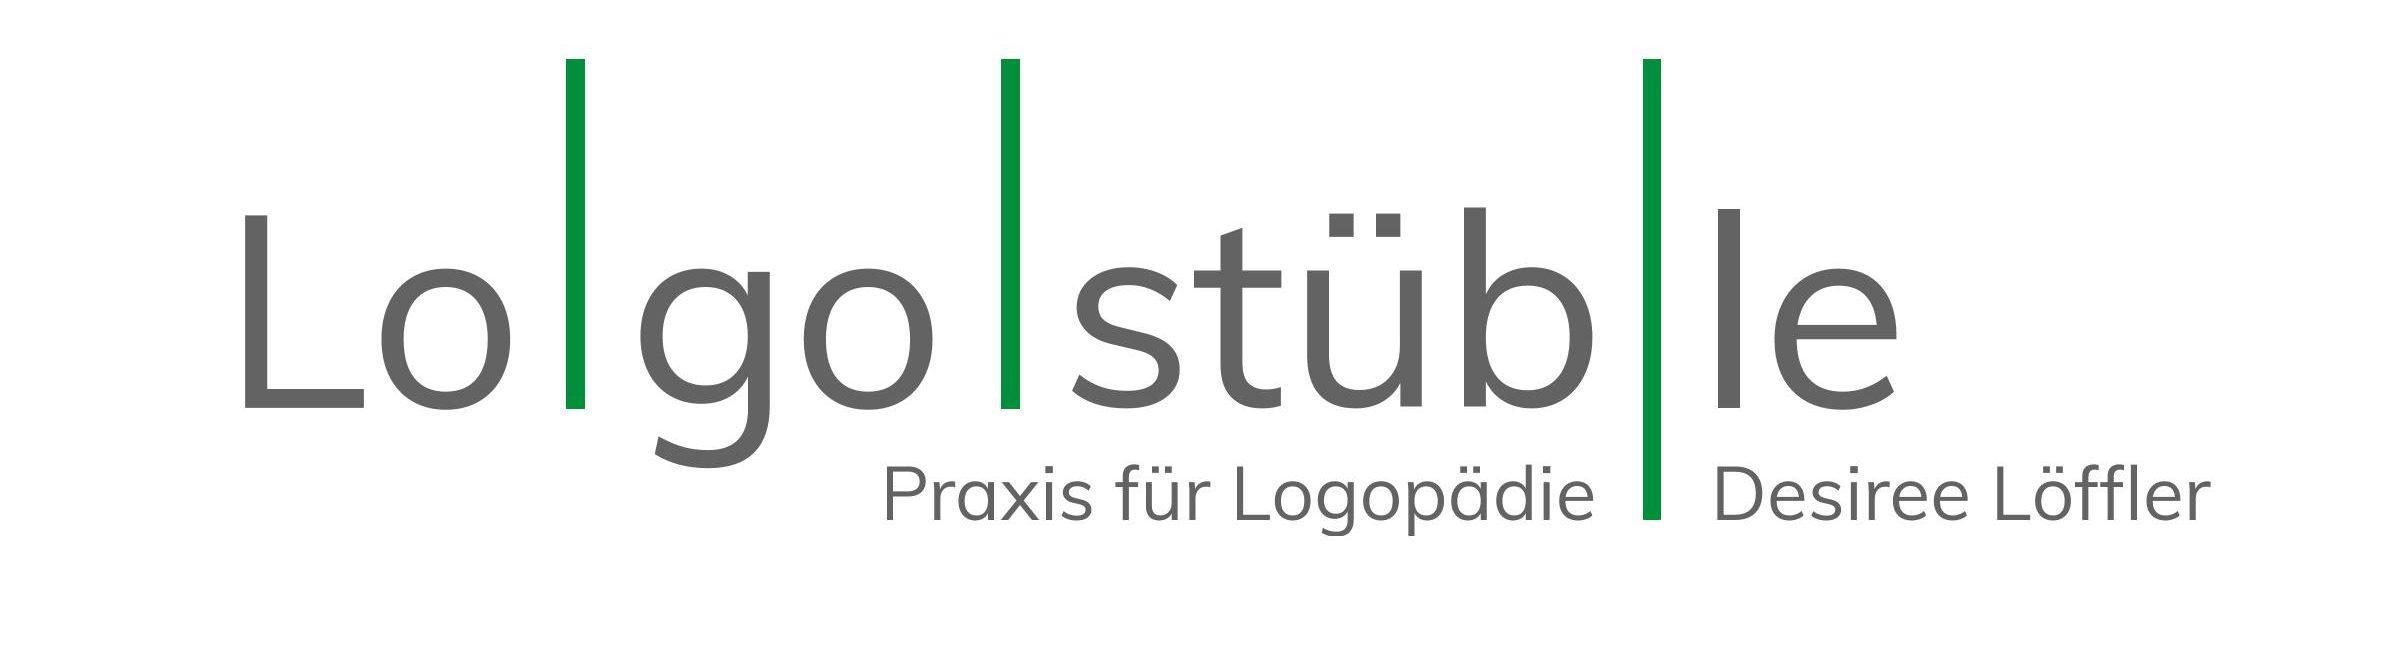 Logostüble – Praxis für Logopädie